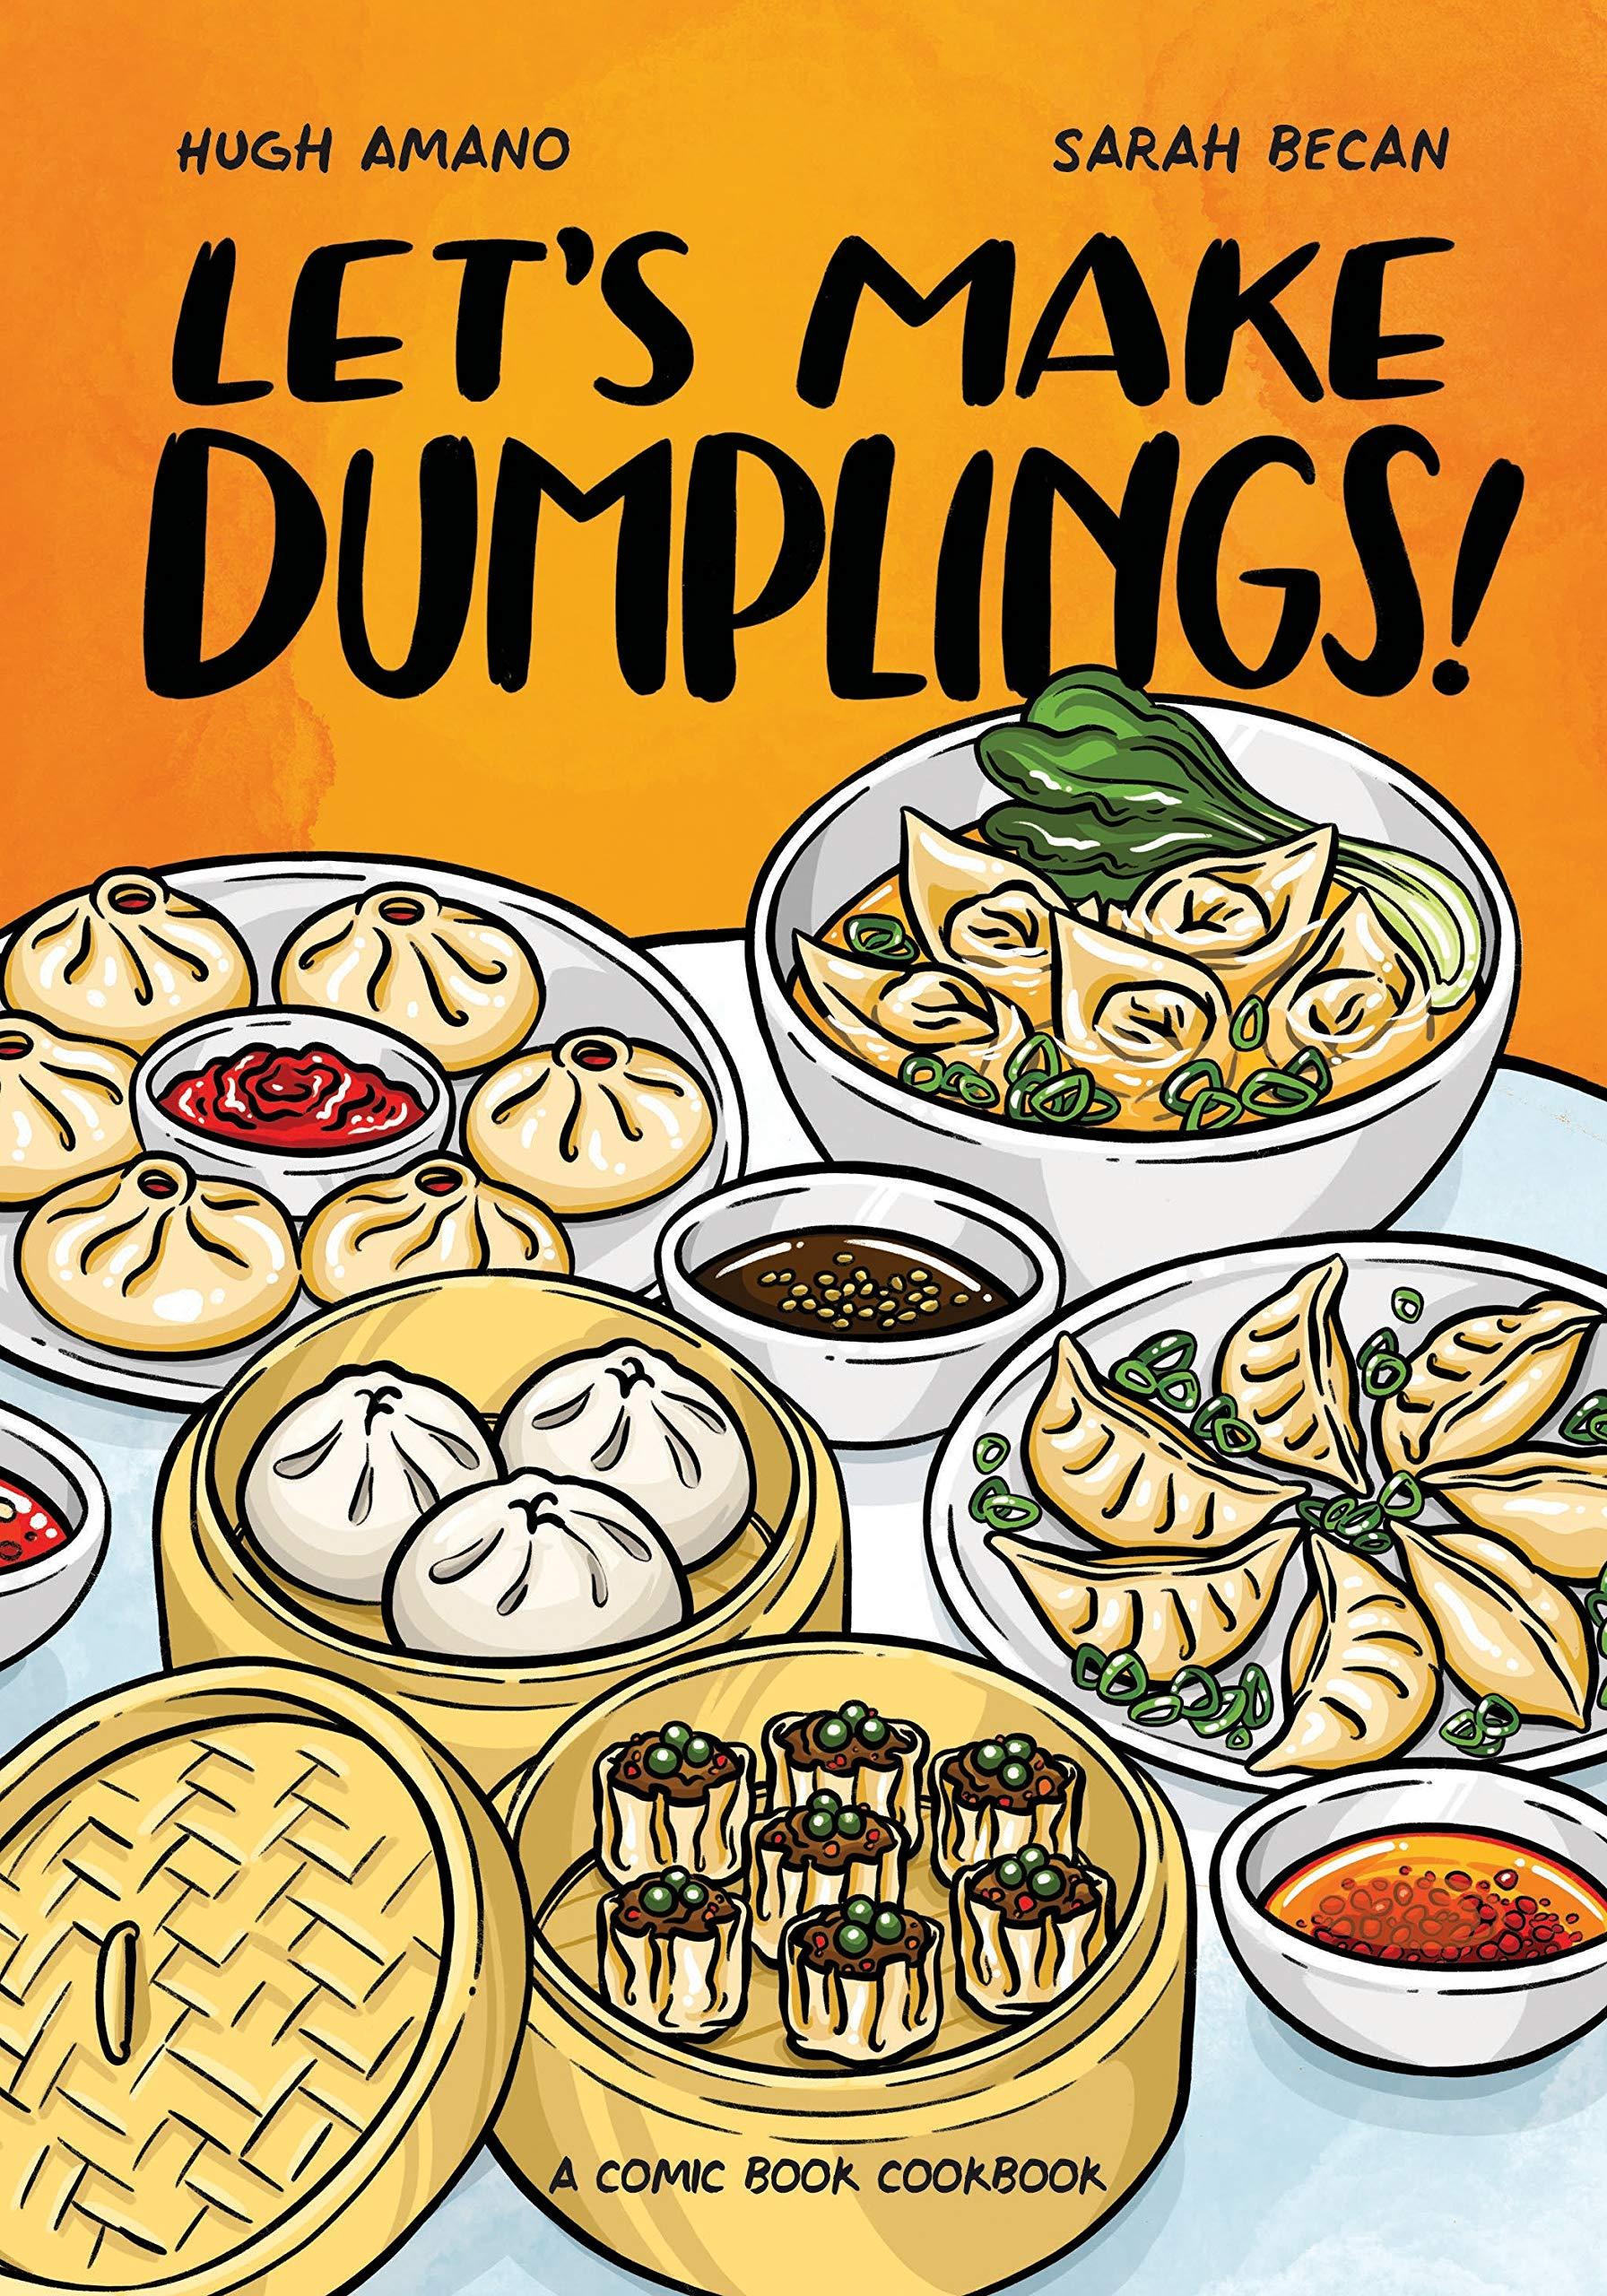 Let's Make Dumplings!: A Comic Book Cookbook: Amano, Hugh, Becan, Sarah:  9781984858757: Amazon.com: Books